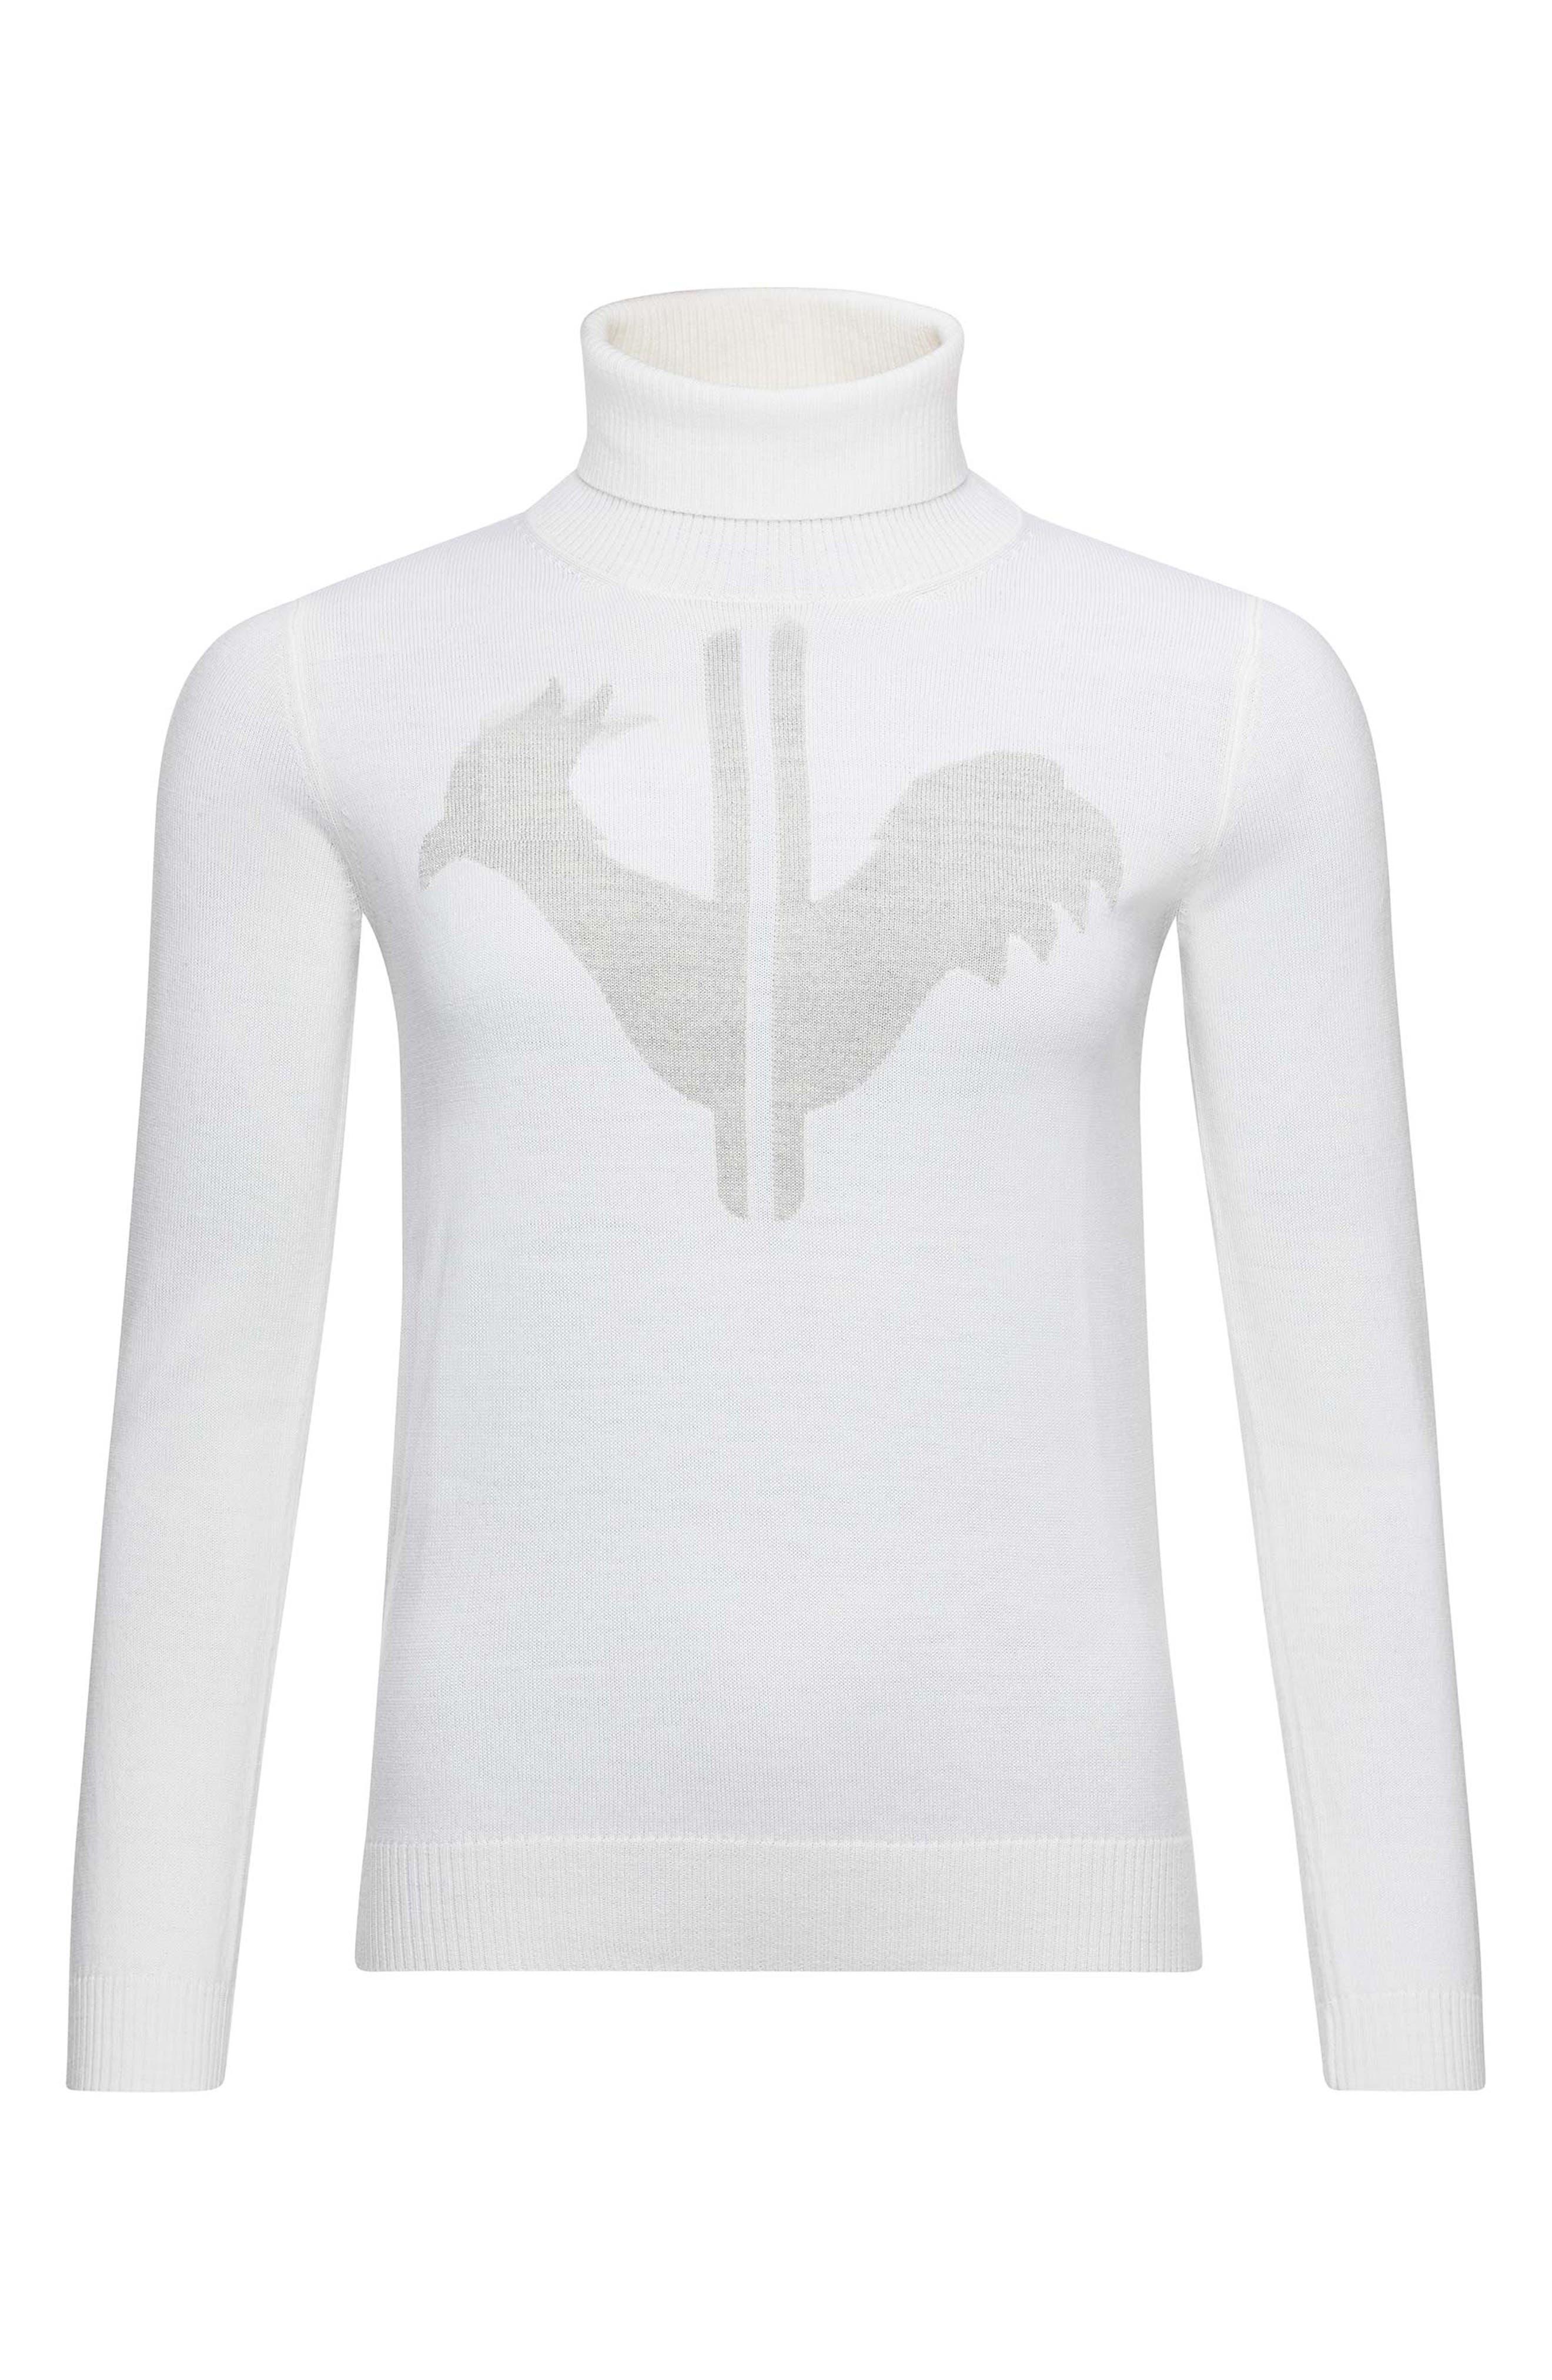 Rossignol Classique Tailored Fit Merino Wool Ski Sweater, White